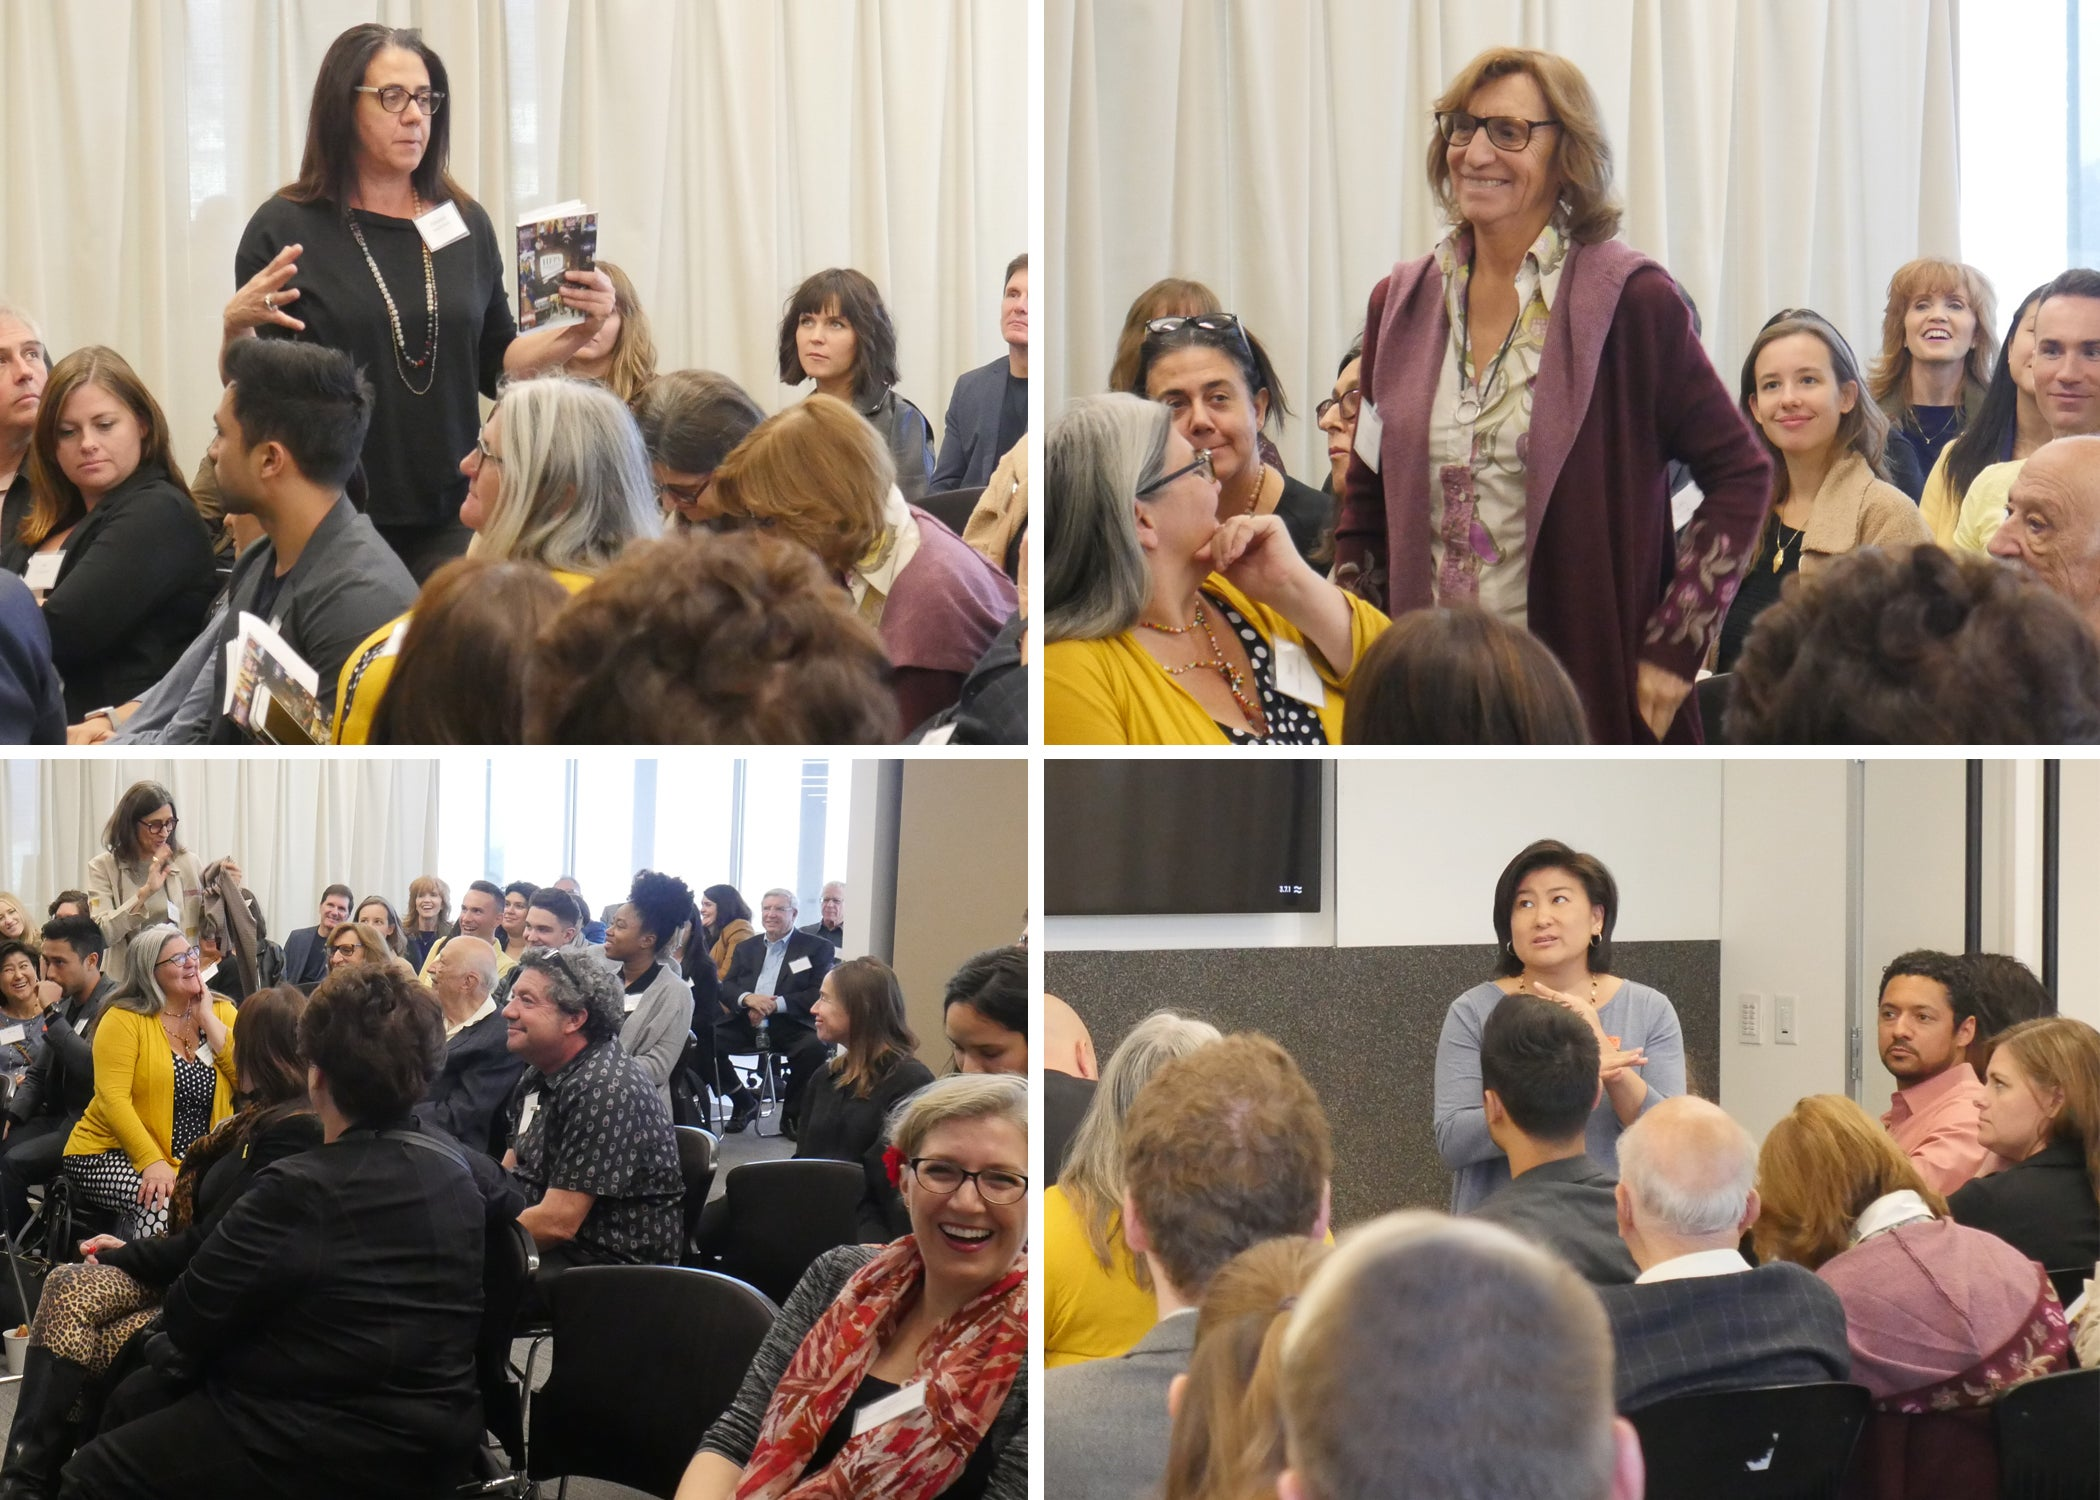 Francesca Guerrini of Global Girl Media, HFPA Grants Committee member Silvia Bizio, HFPA Grant Committee member Alessandra Venezia addresses the group, Michelle Sugihara of Coalition of Asian Pacifics in Entertainment